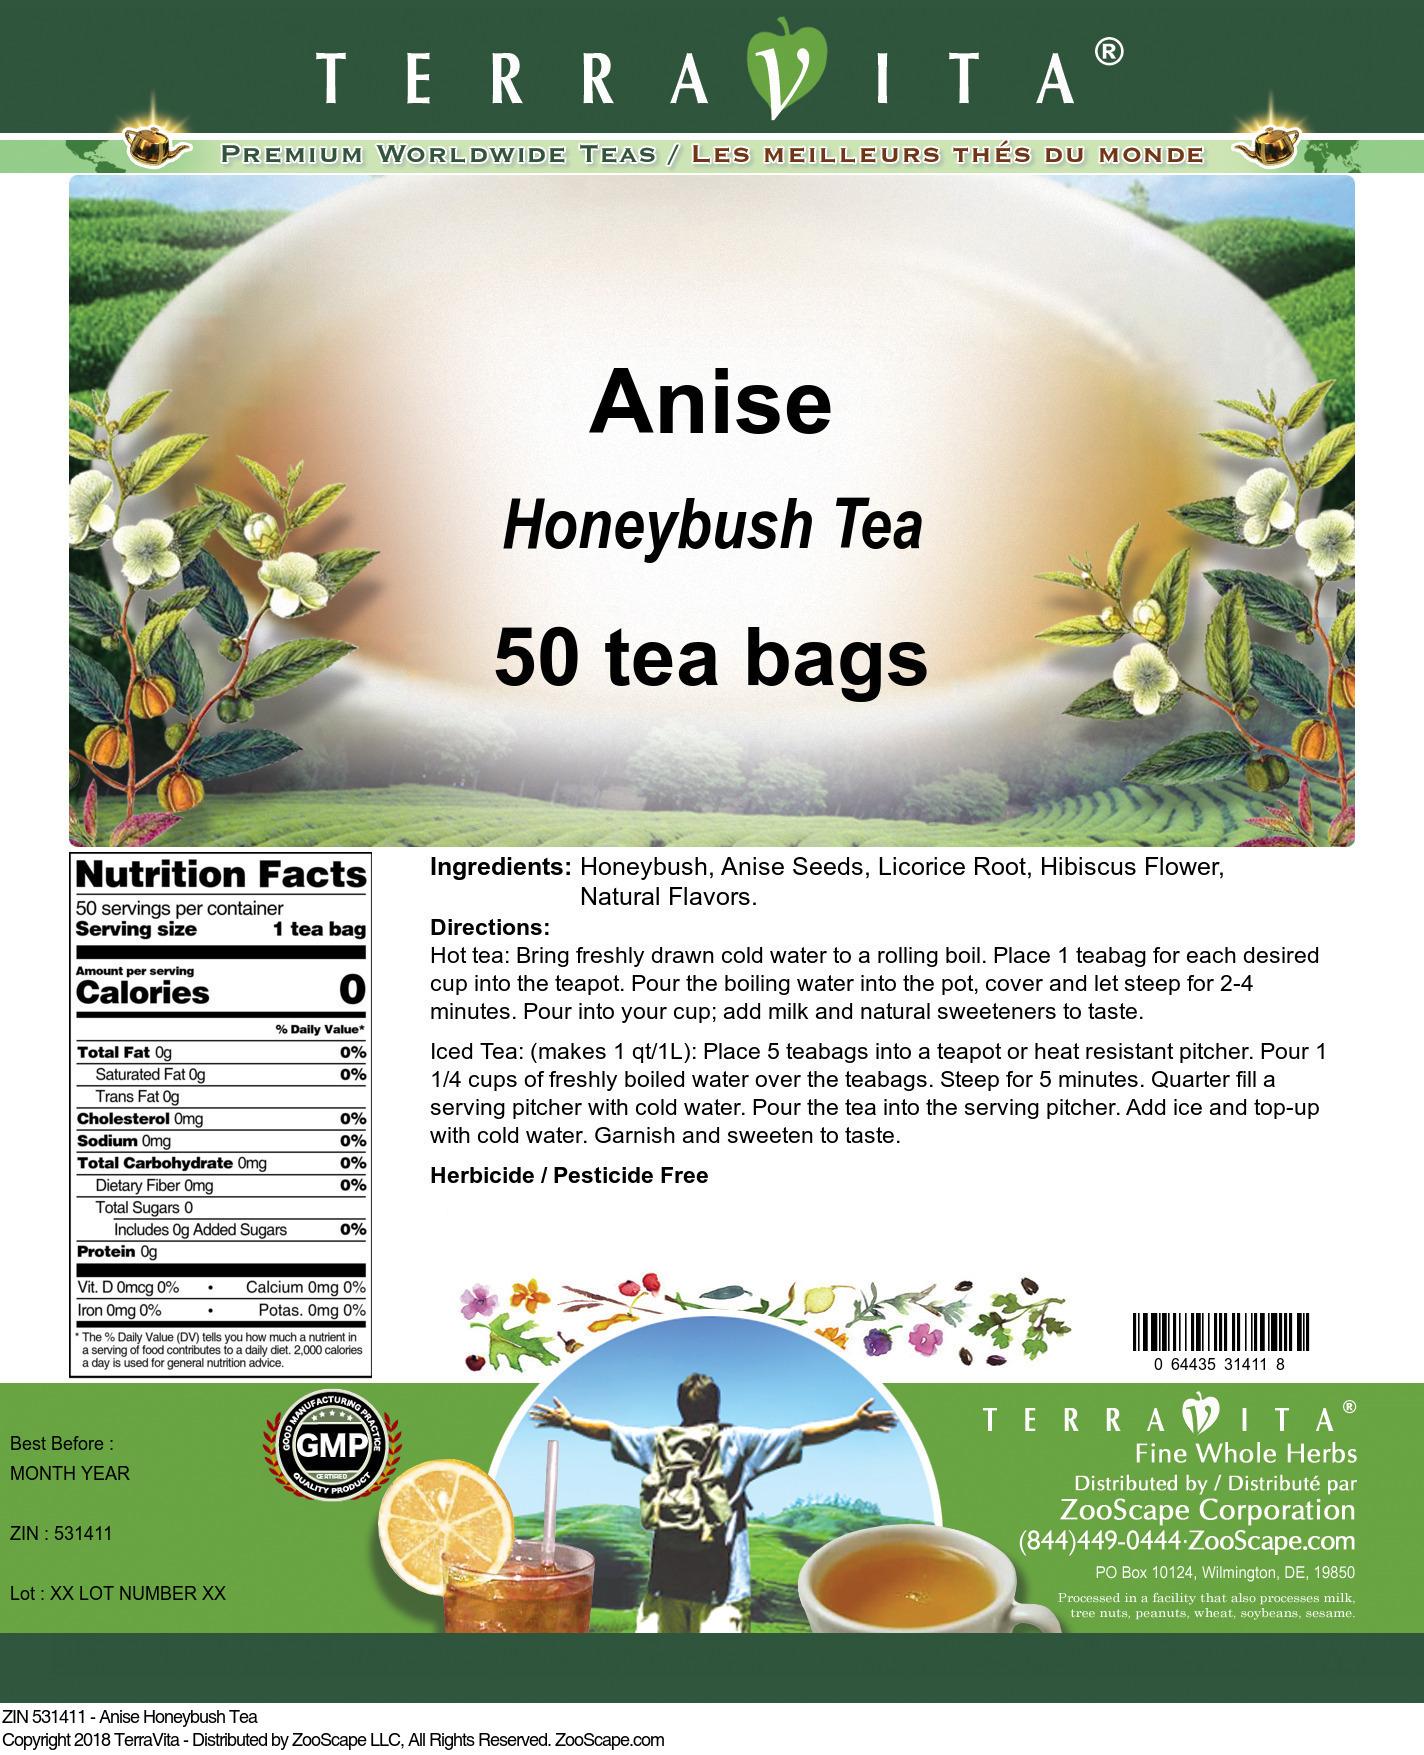 Anise Honeybush Tea